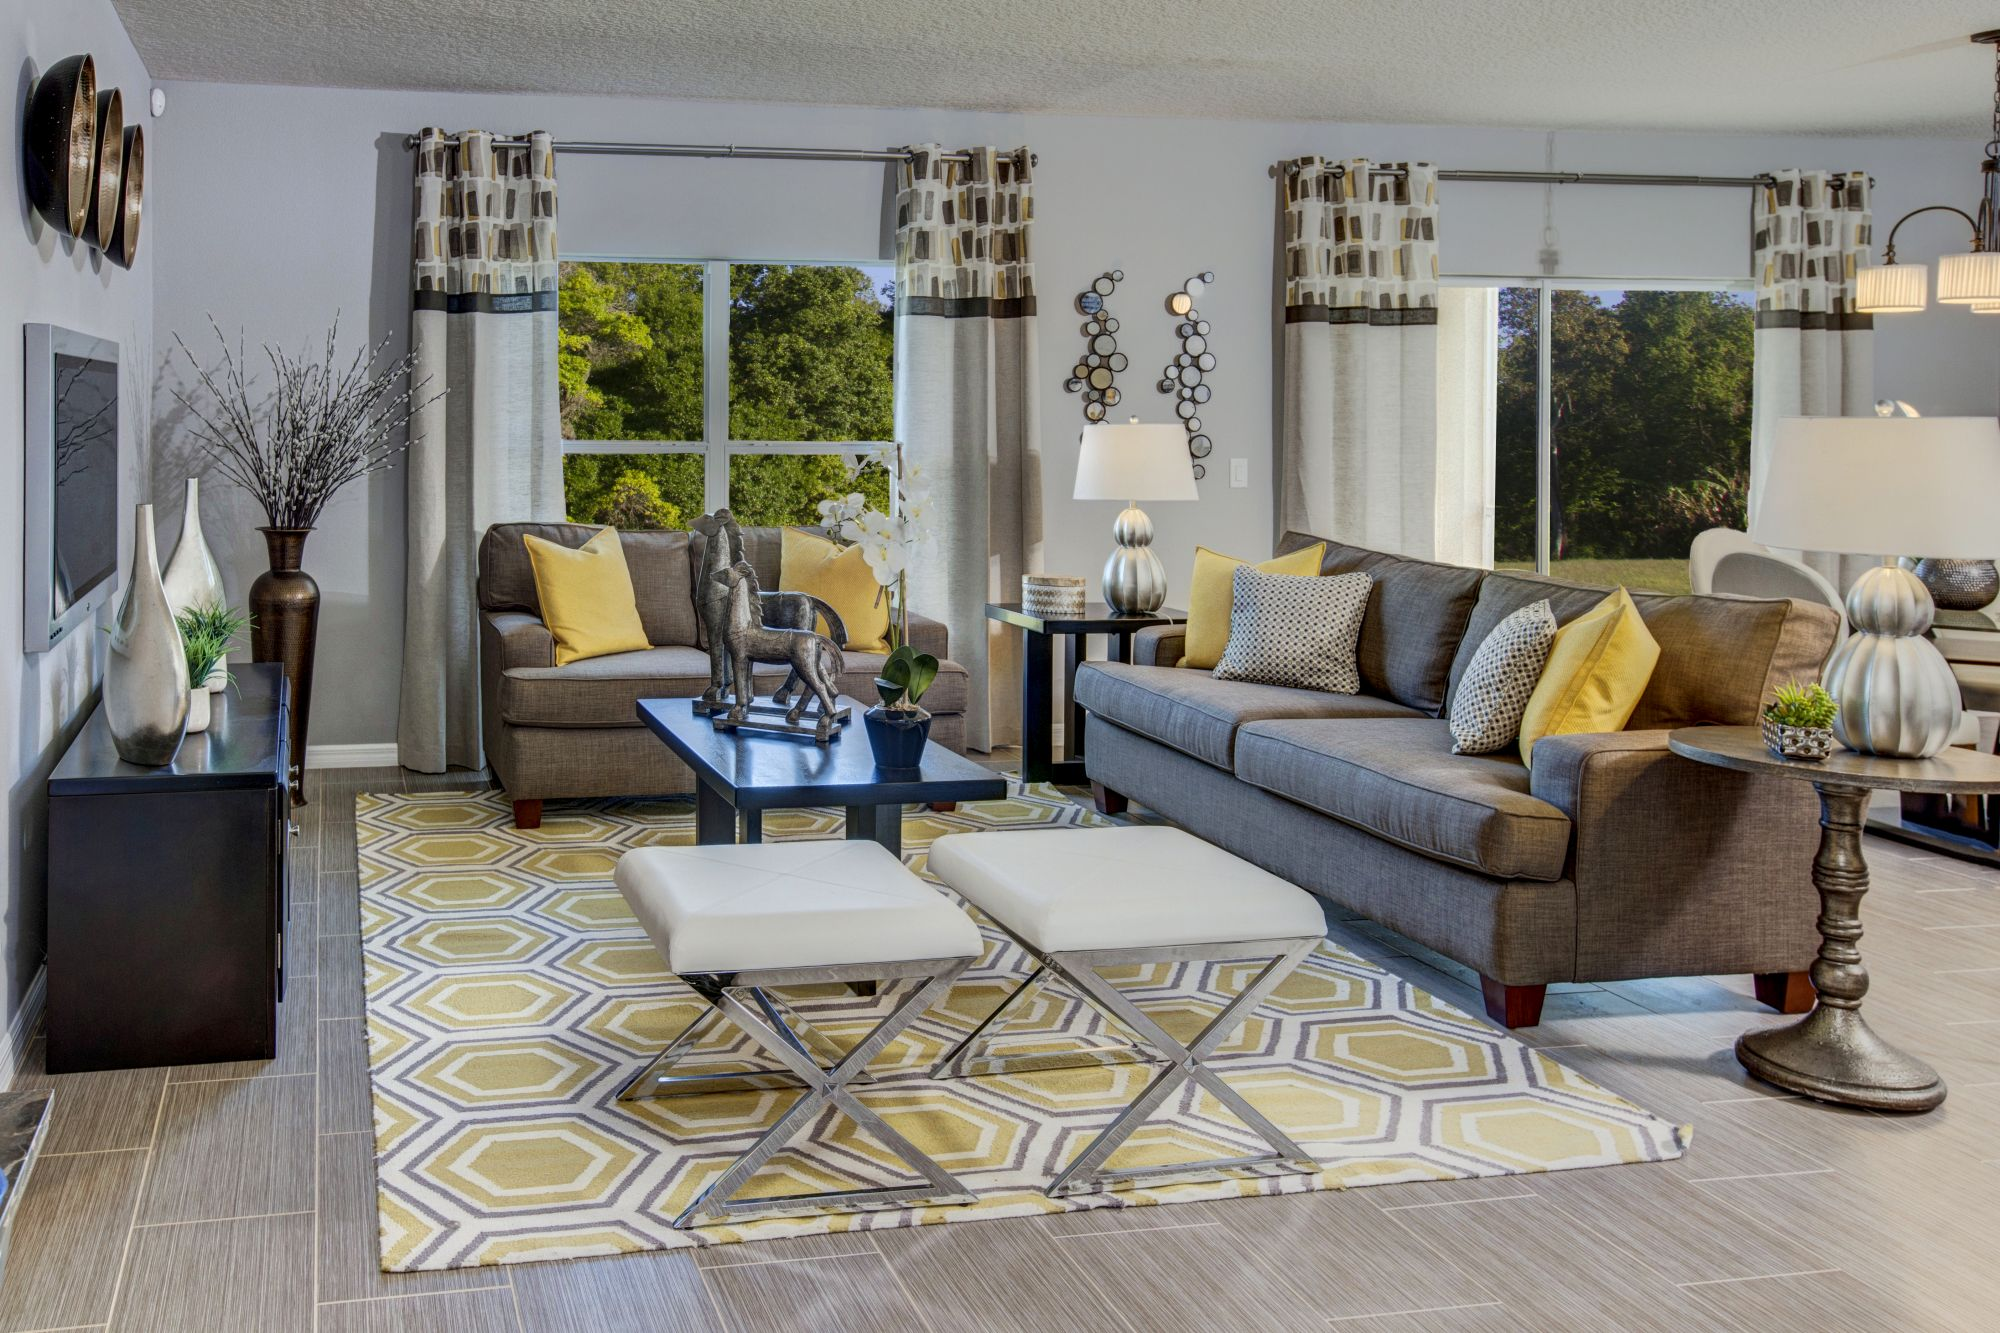 Westmorly Living Room Marbella Resort Davenport, Florida